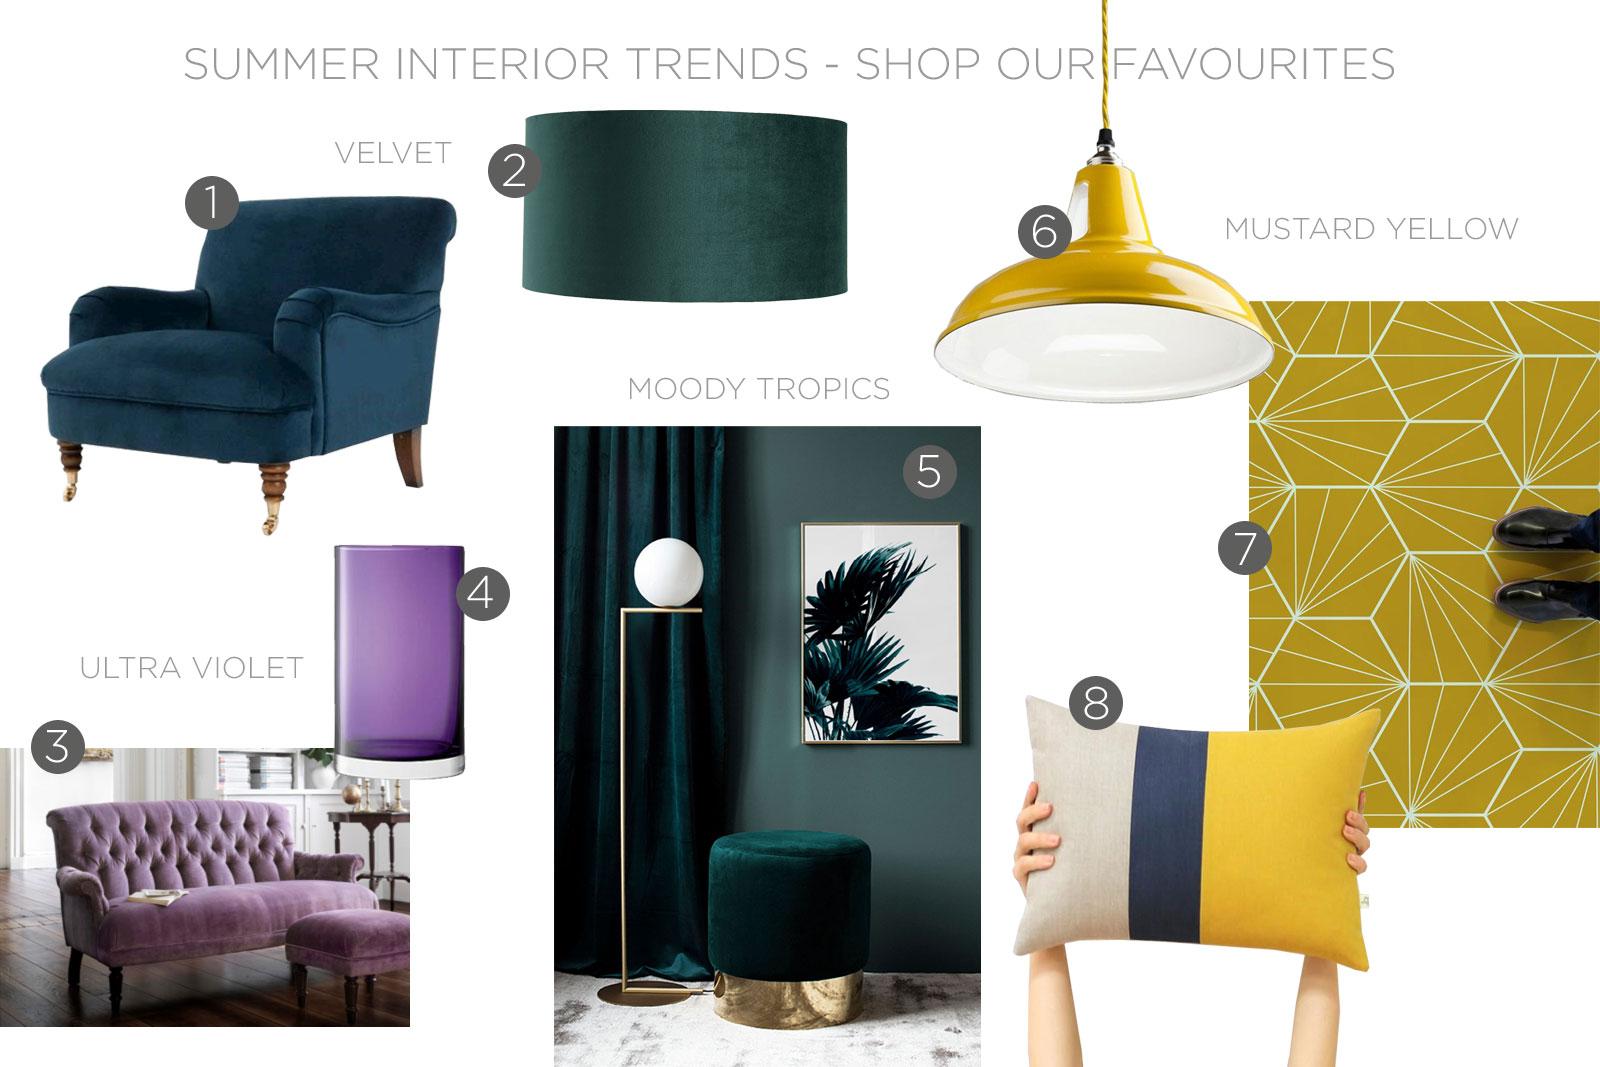 Summer Interior Trends, 2019 Interiors, 2019 Interior Design, Interior Design Trends